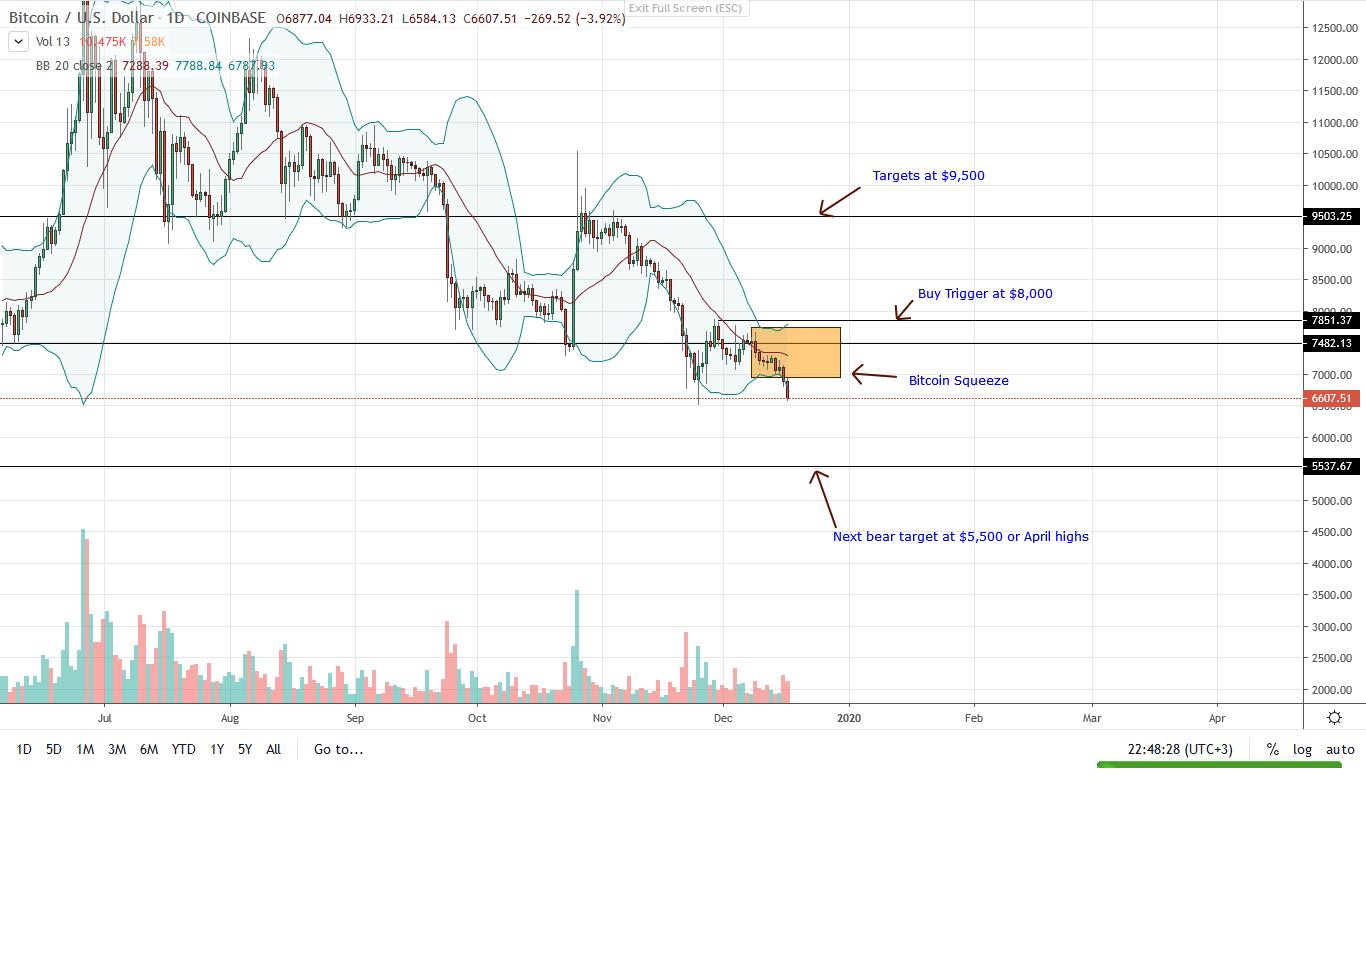 Bitcoin BTC Daily Chart for Dec 17